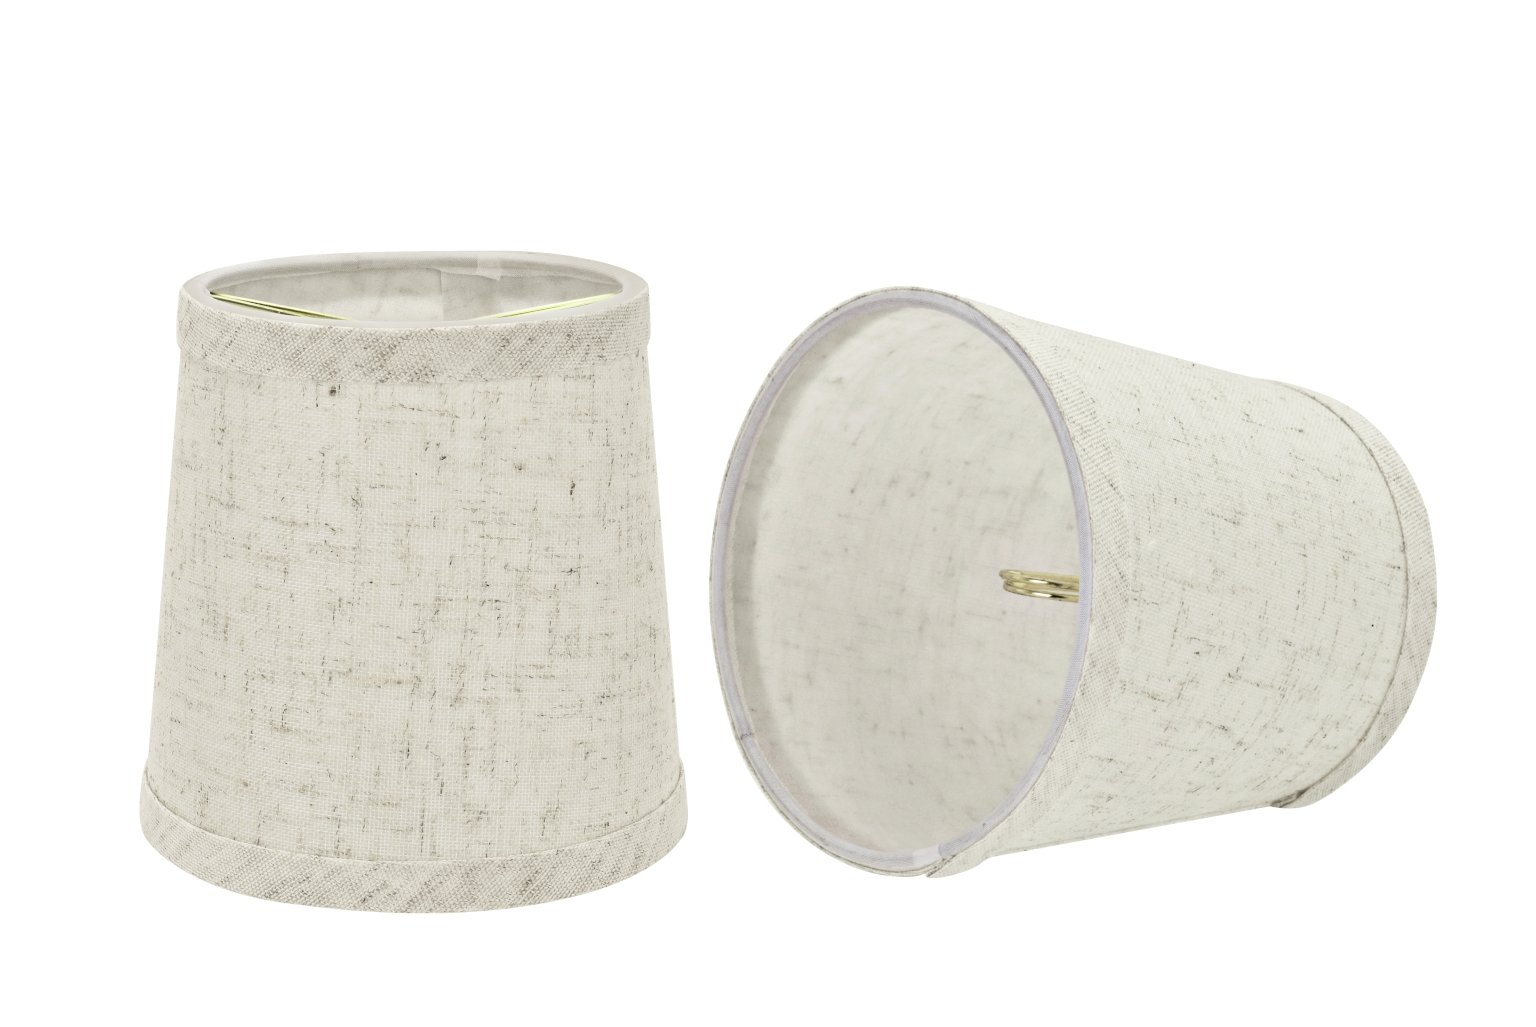 Aspen Creative 32832-2 Small Hardback Empire Shape Chandelier Clip-On Lamp Shade Set (2 Pack), Transitional Design in Flaxen, 5'' bottom width (4'' x 5'' x 5'')